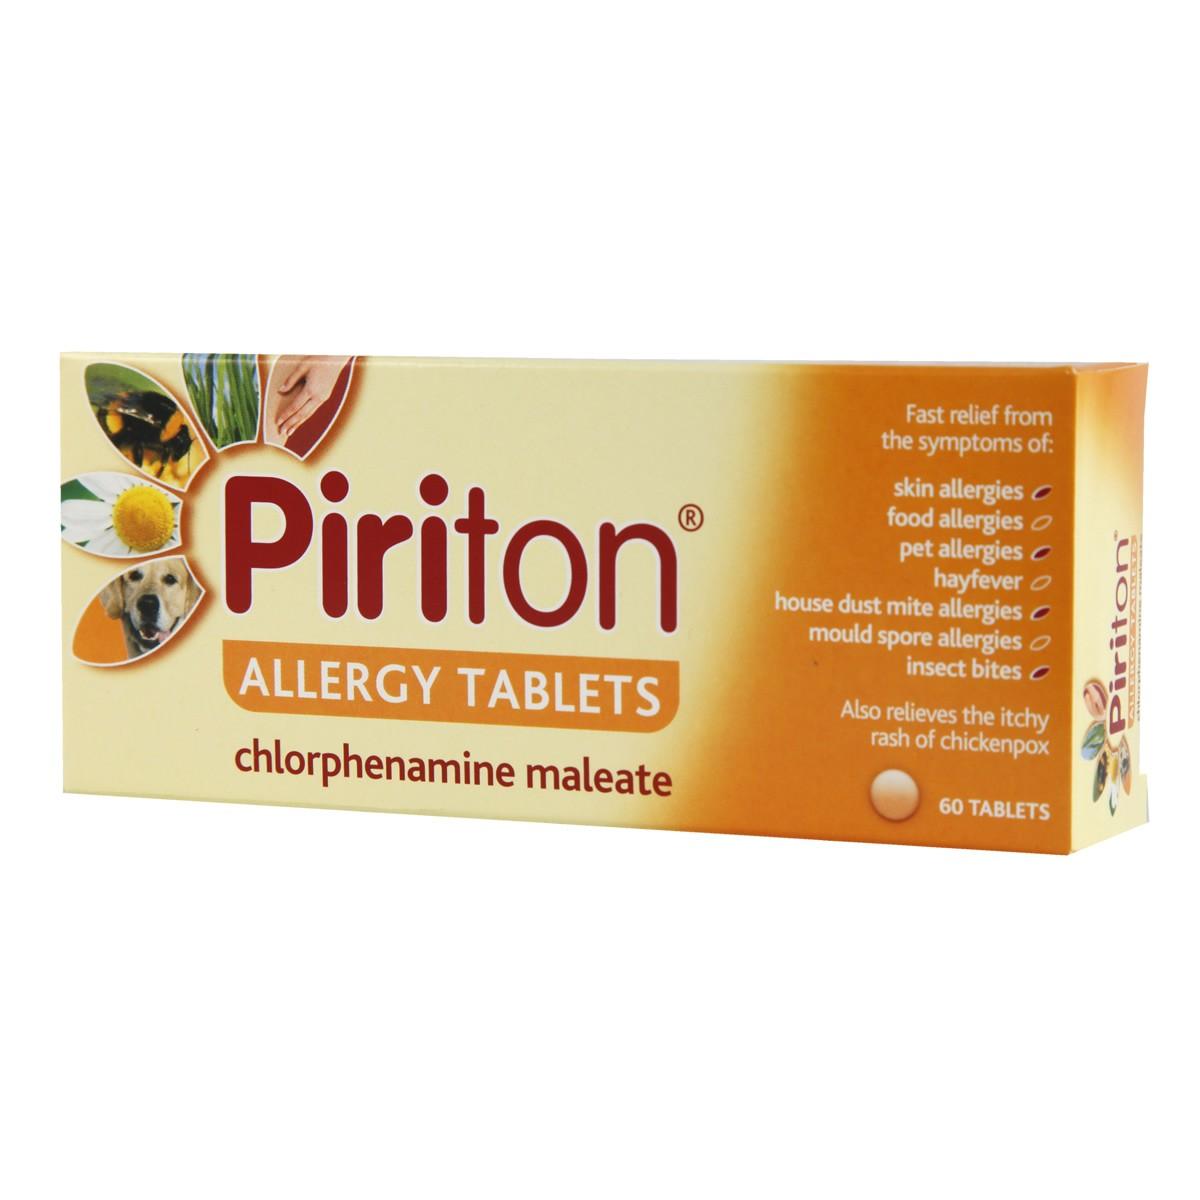 Piriton Allergy Tablets